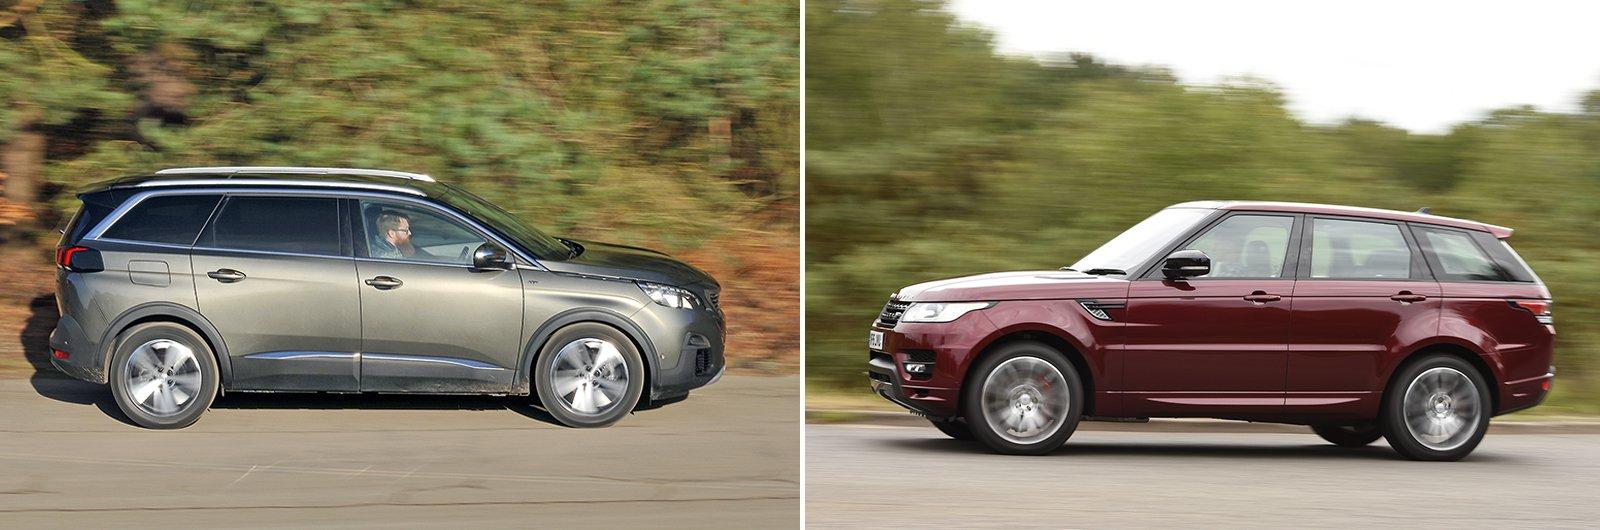 New Peugeot 5008 vs used Range Rover Sport side profile